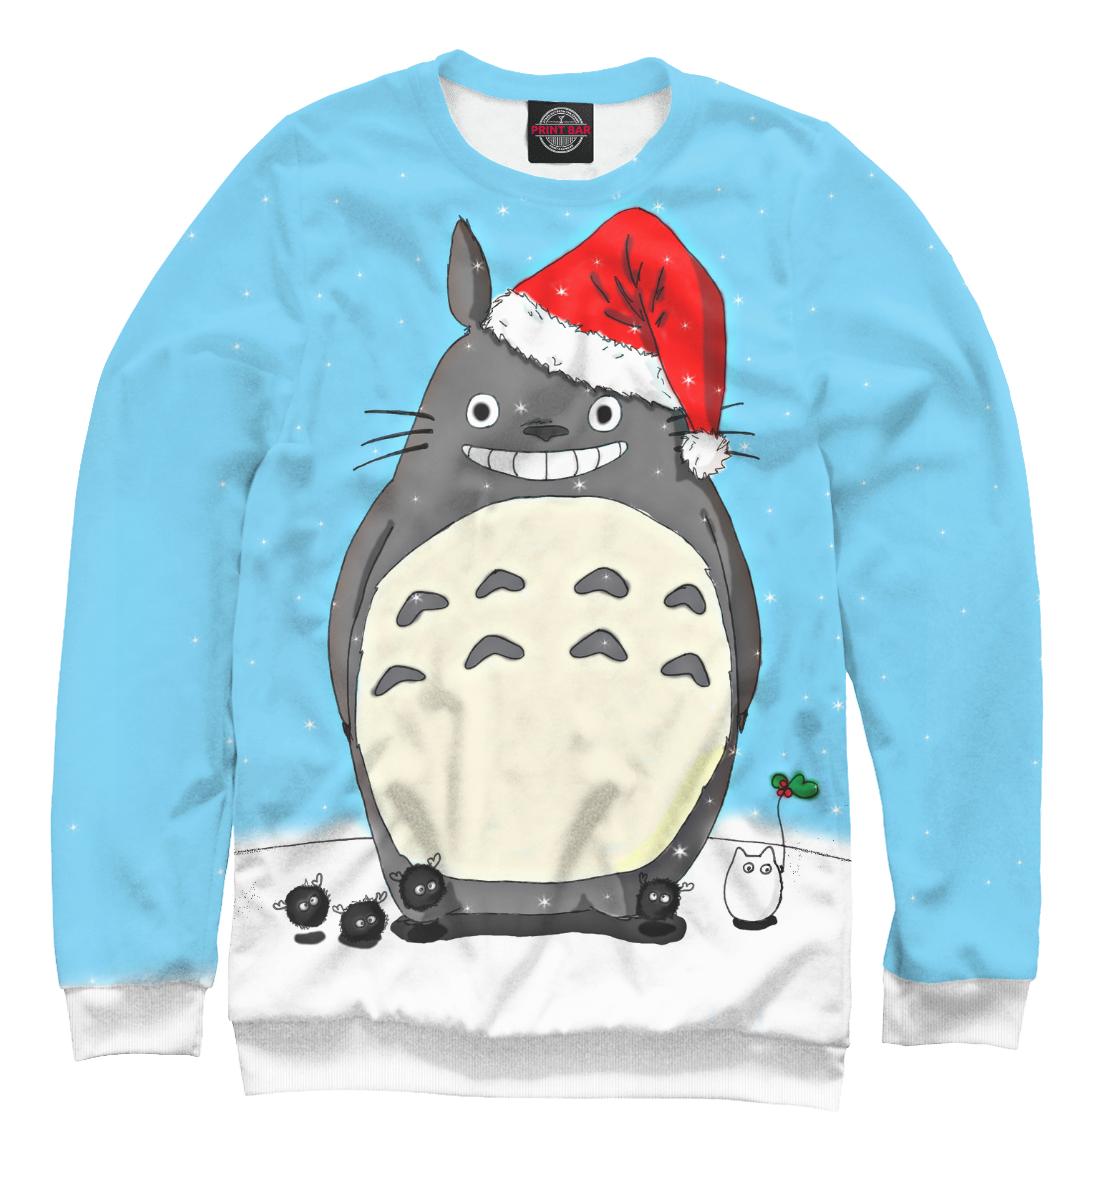 Купить Year Totoro, Printbar, Свитшоты, NOV-155956-swi-1